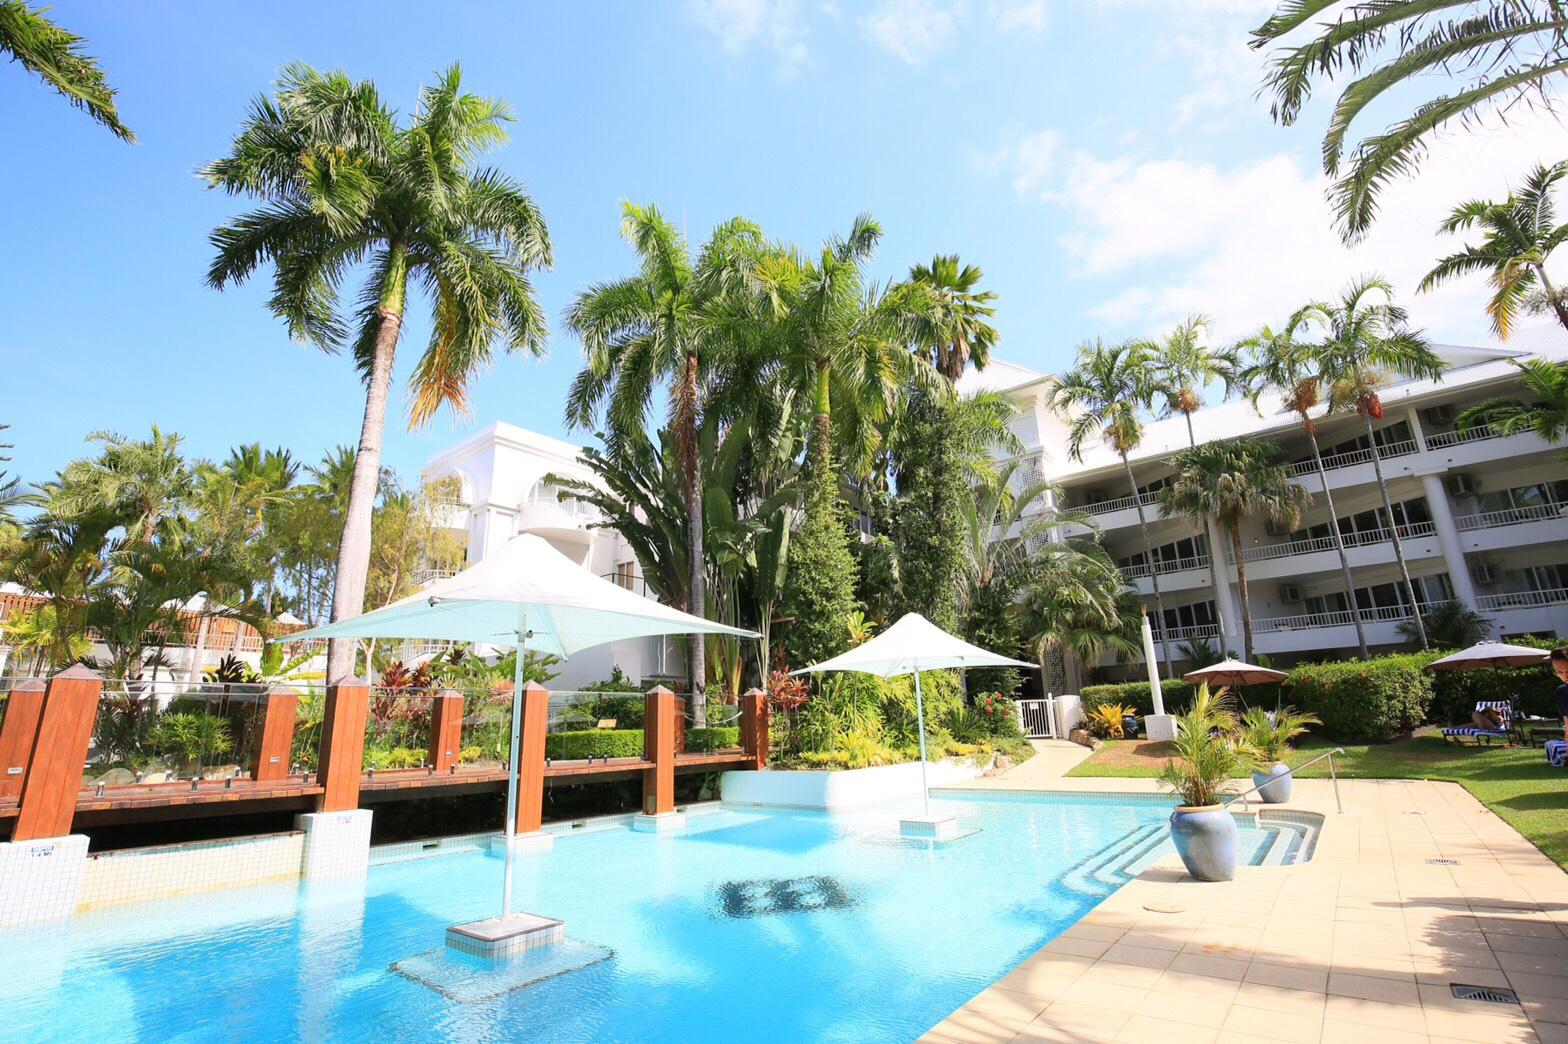 Alamanda Palm Cove by Lancemore